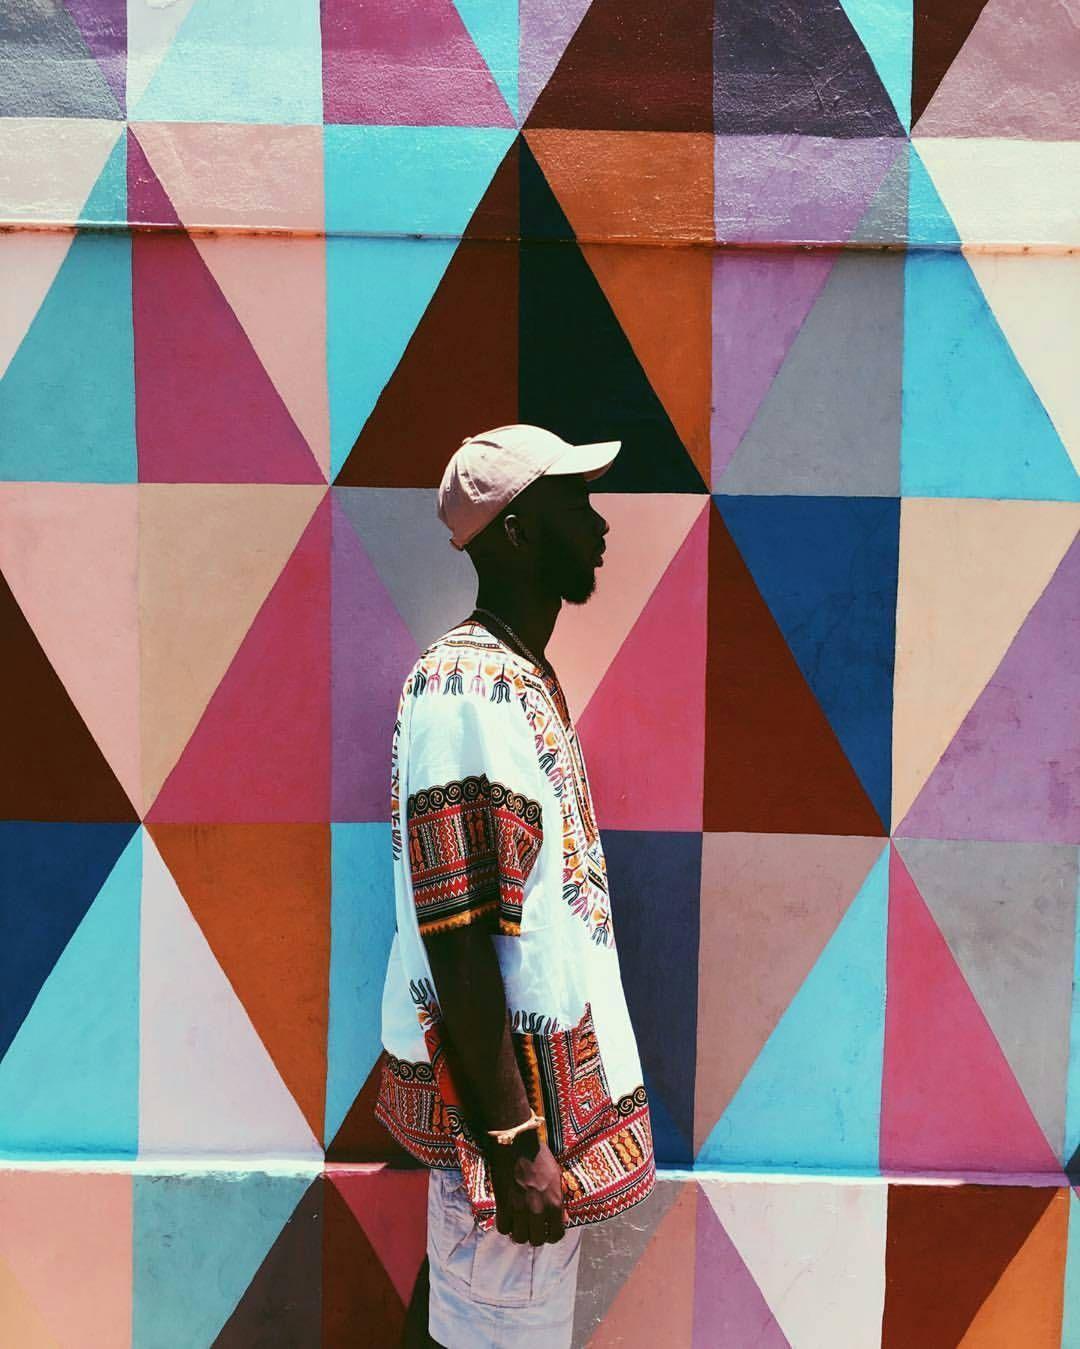 Patterns  @okuntakinte  ______ #Osengwa | #AfricanArt | #AfricanFashion | #AfricanMusic | #AfricanStyle | #AfricanPhotography | #Afrocentric | #Melanin | #African | #Art | #AfricanInspired | #InspiredByAfrica | #BlackIsBeautiful | #ContemporaryArt | #OutOfAfrica